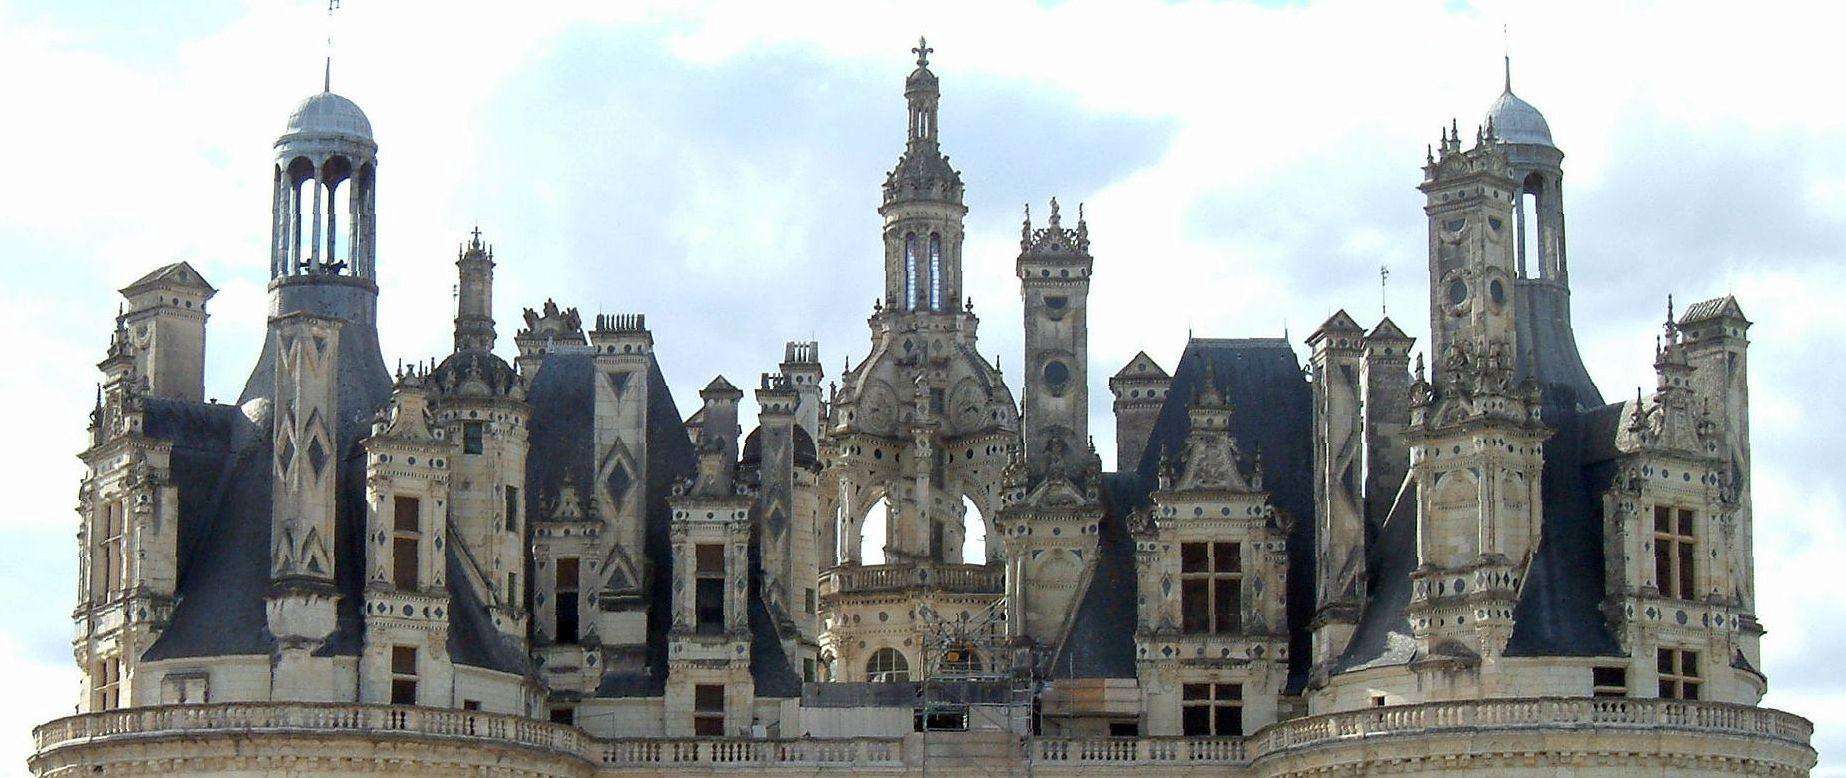 Château_de_Chambord_19.jpg